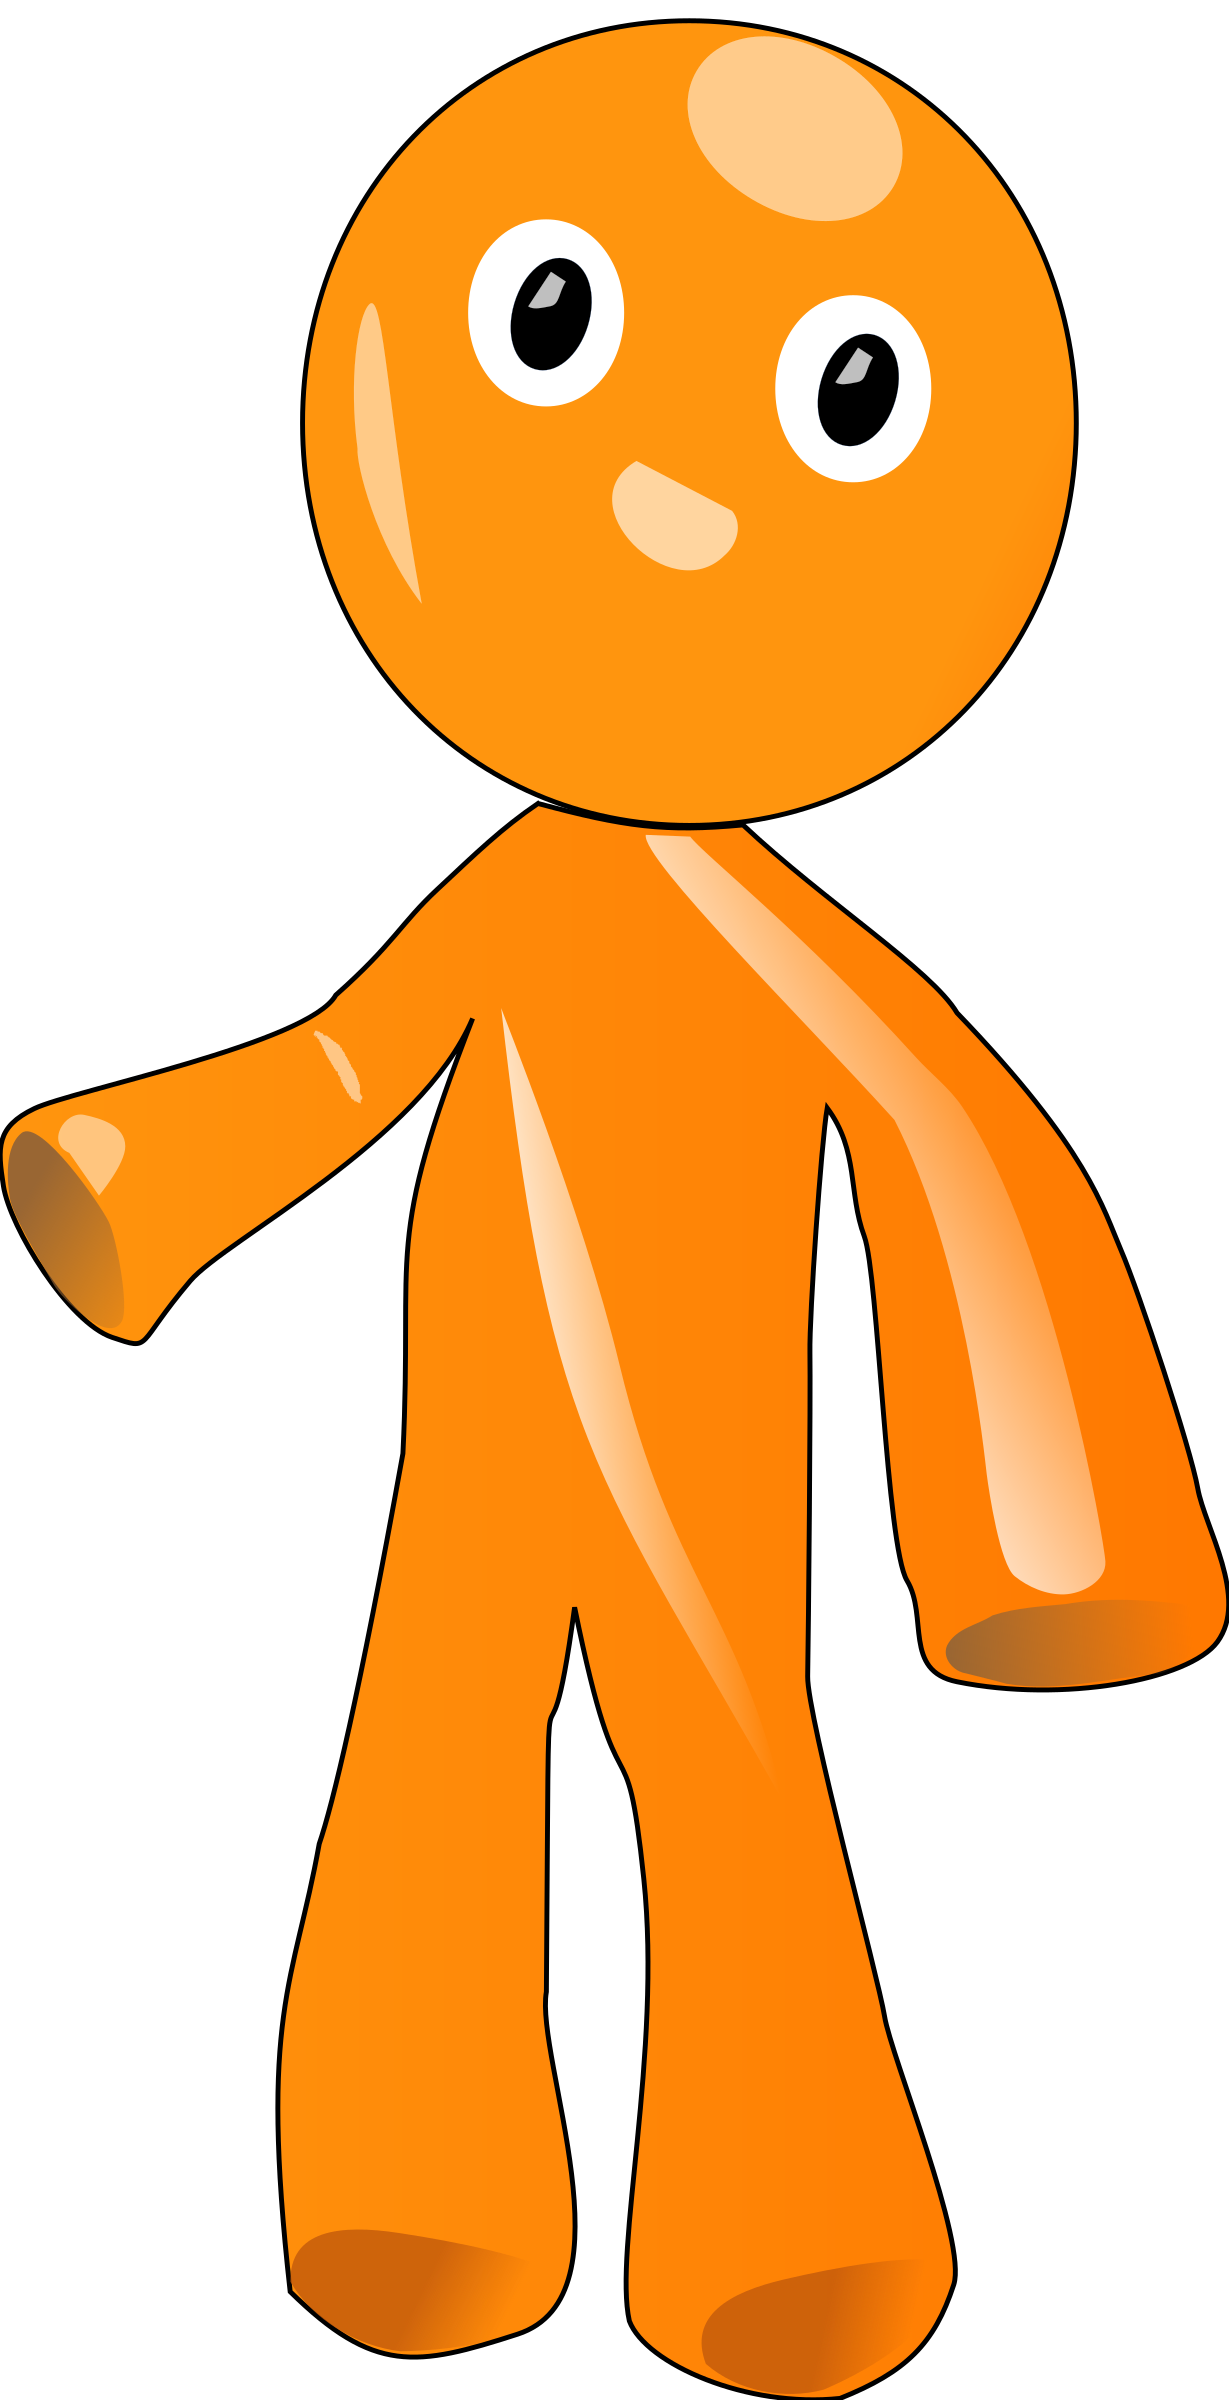 Clipart - gingerbread man